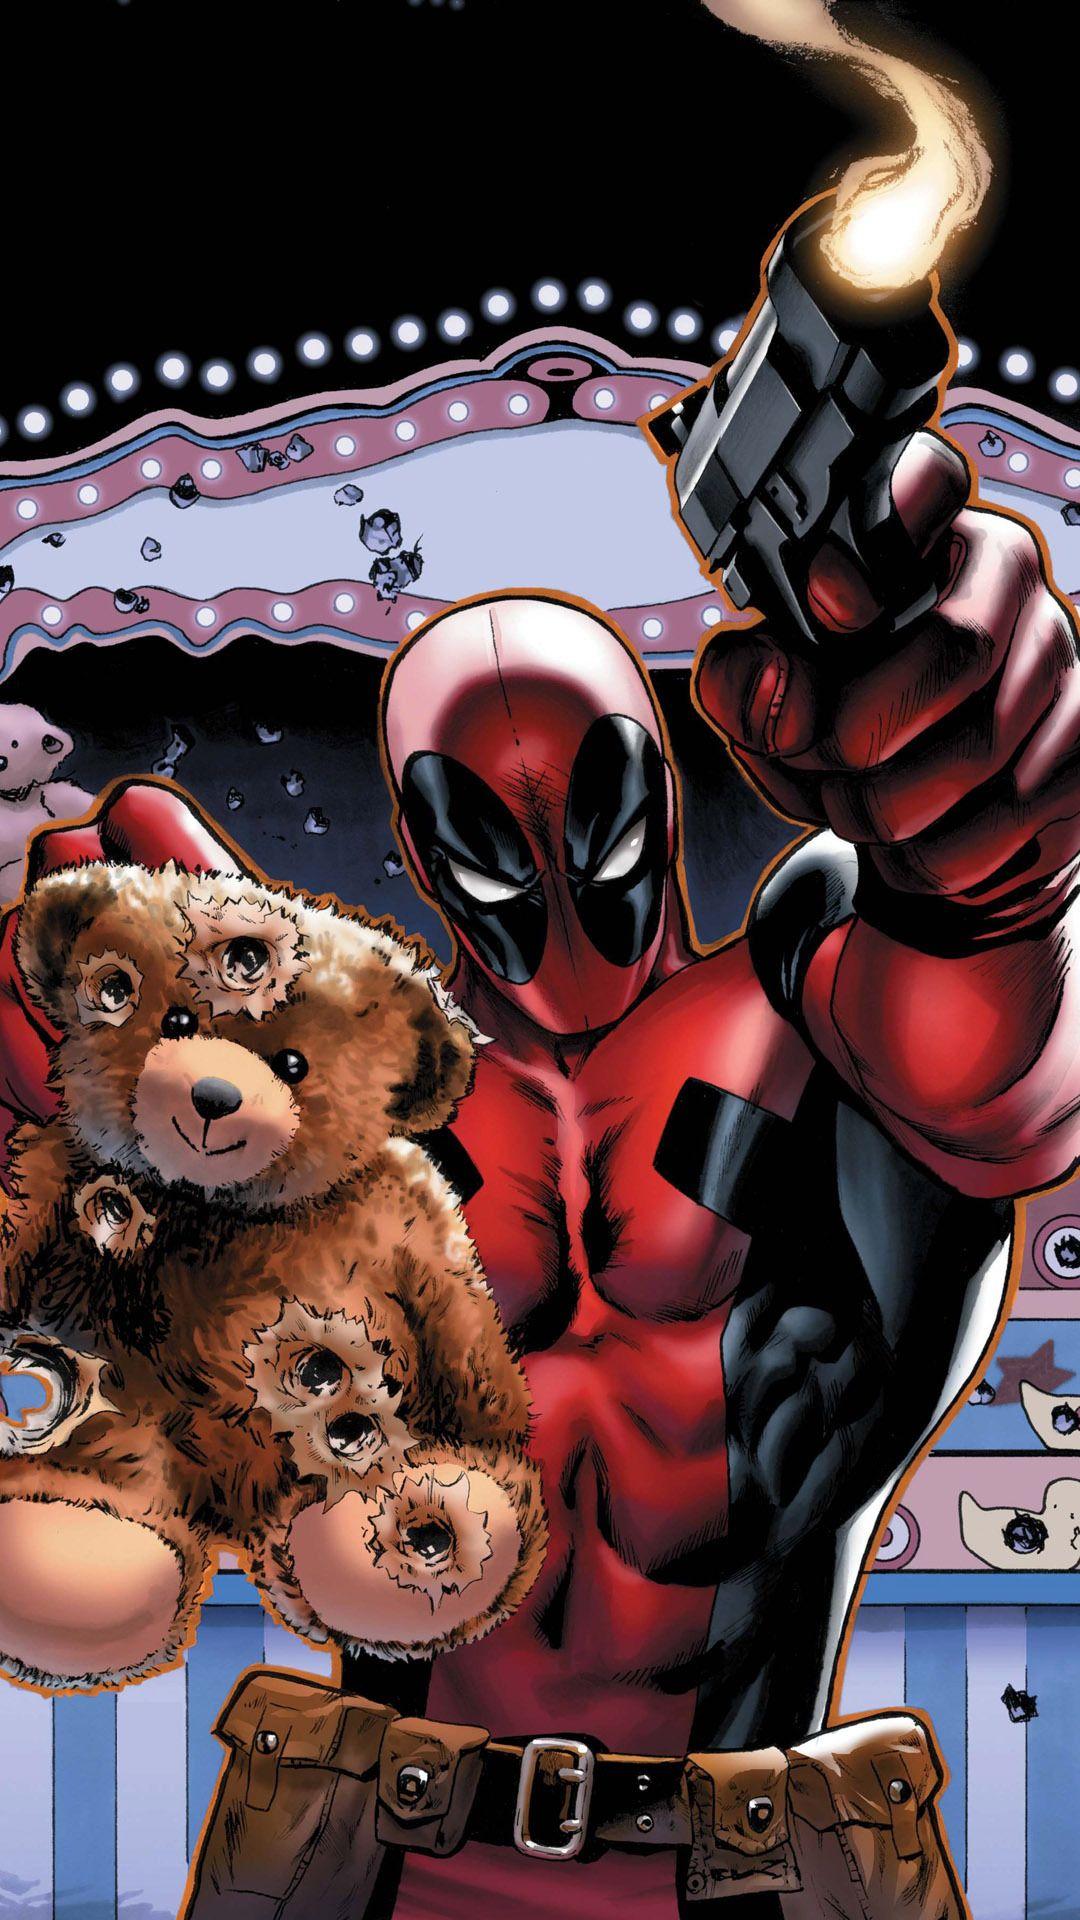 Comic Deadpool Background Image In 2020 Deadpool Deadpool Background Deadpool Wallpaper